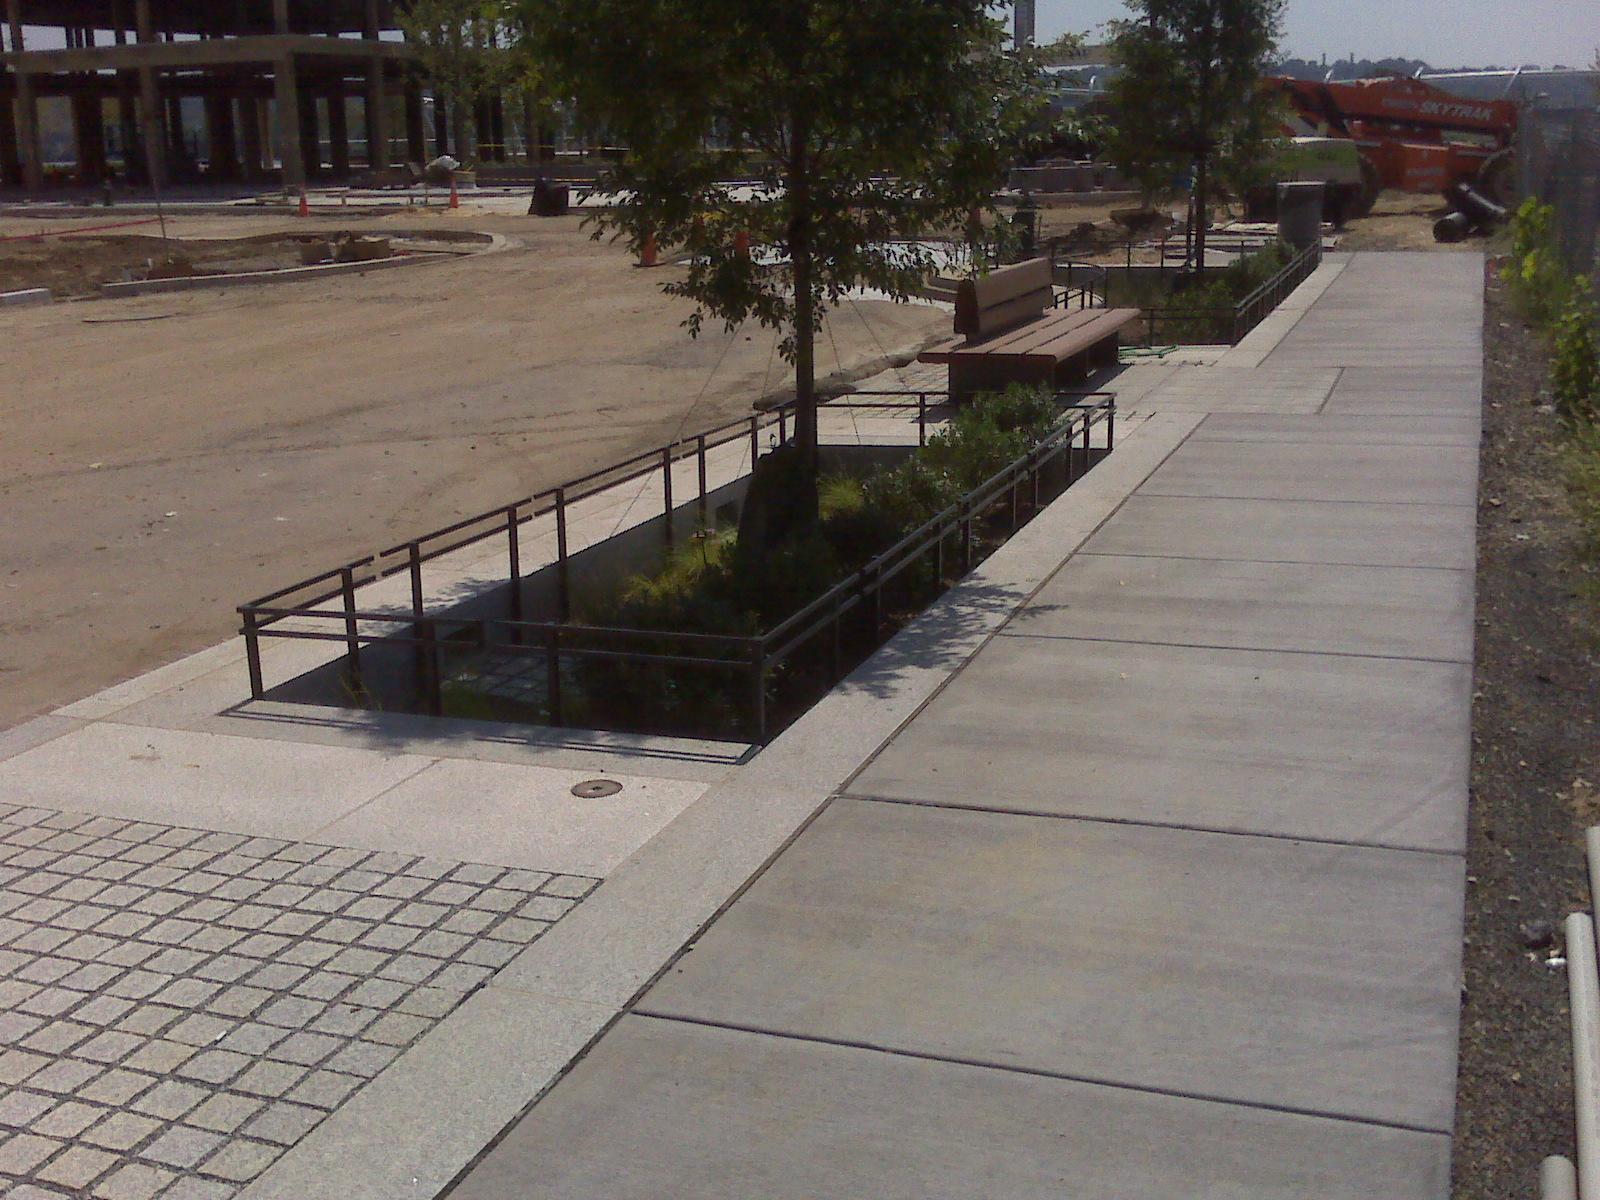 Low Impact Development Stormwater : Low impact development near the navy yard « city block